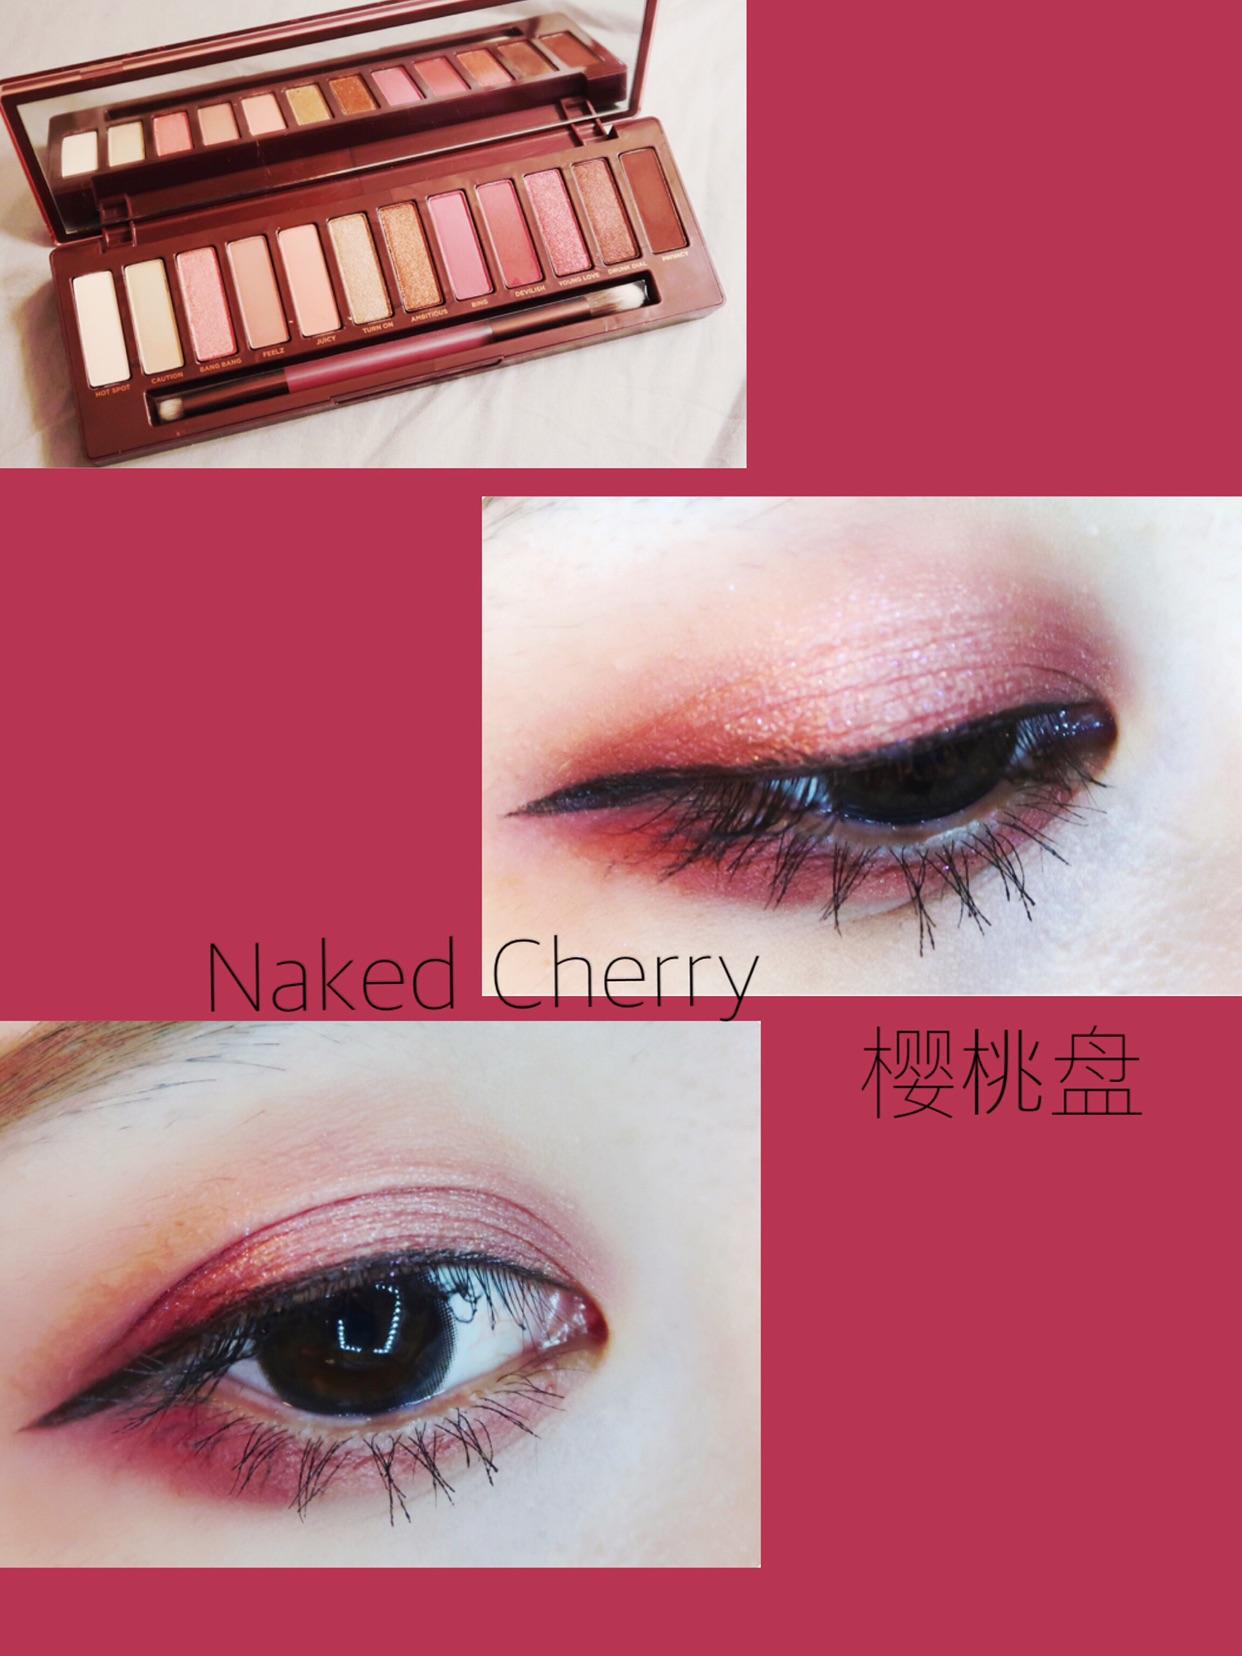 Naked Cherry盘🍒试色来啦!!